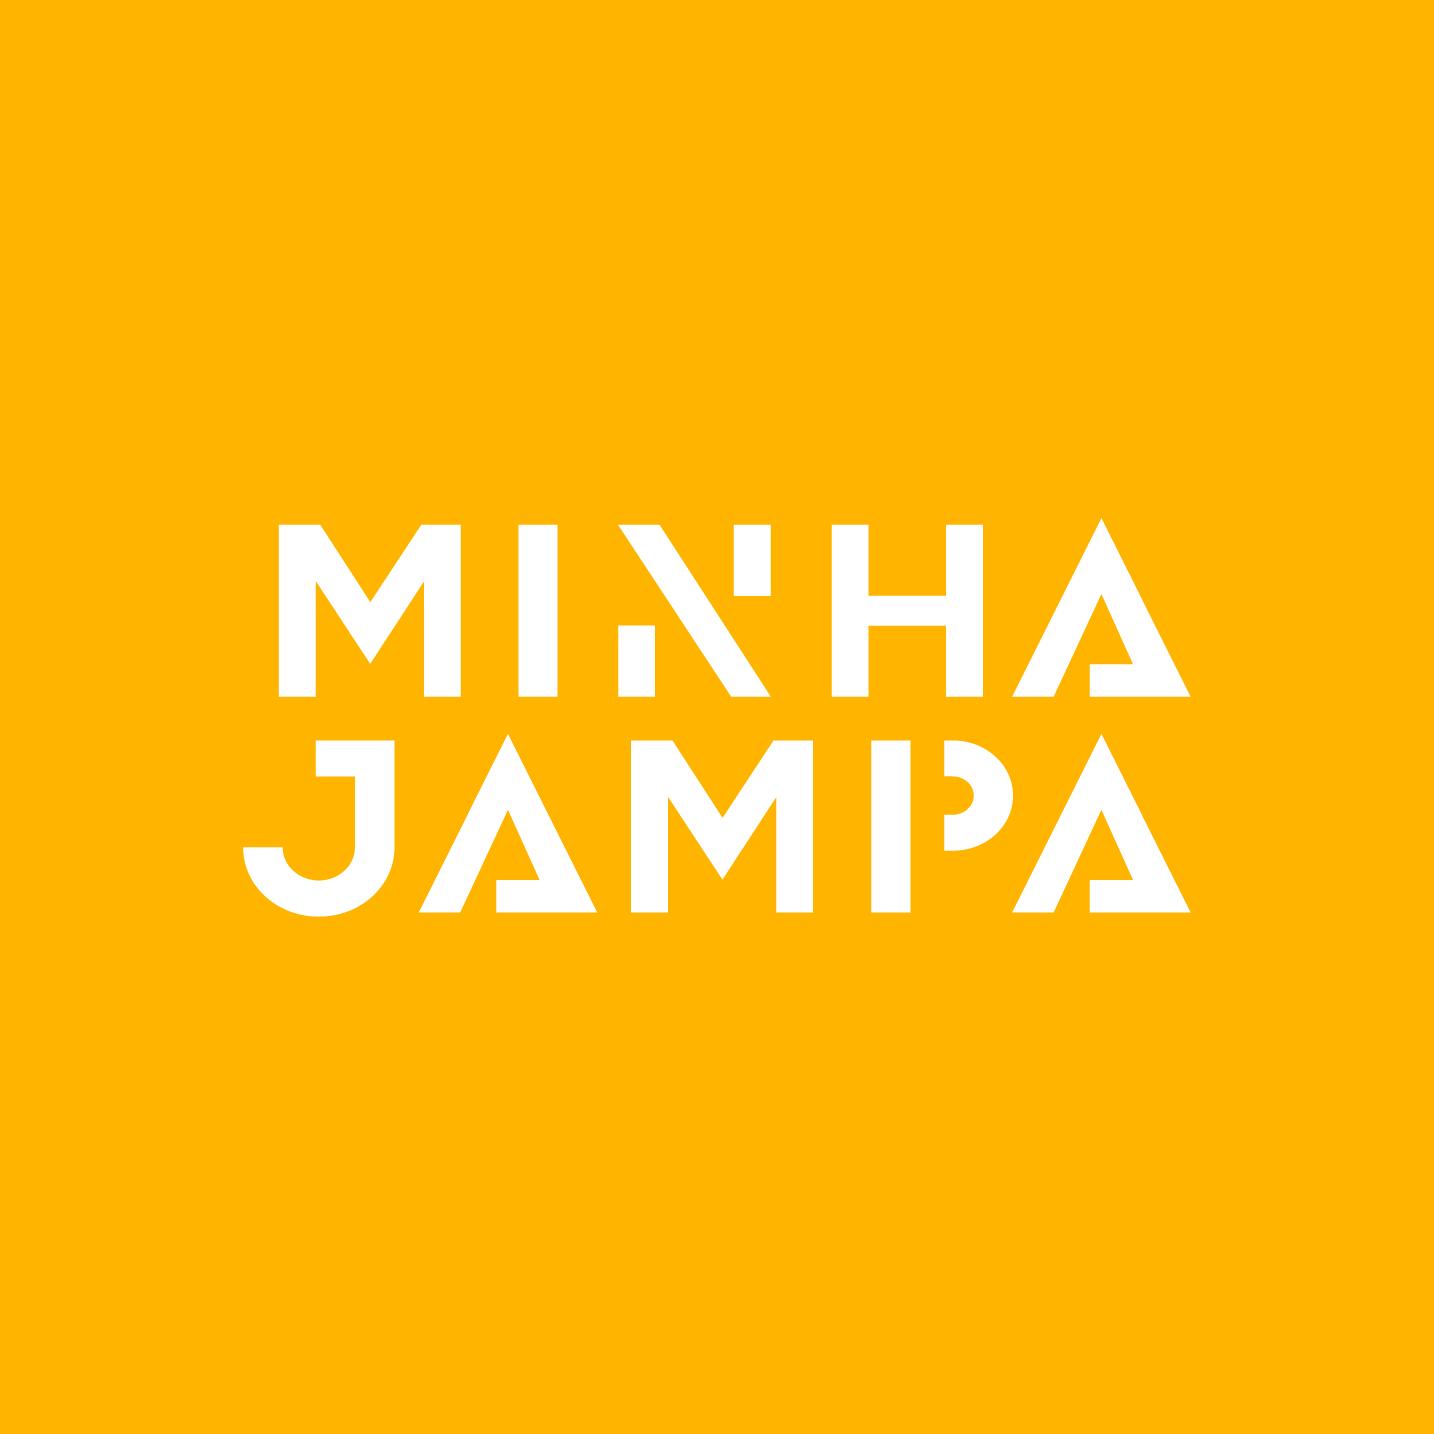 Minha Jampa